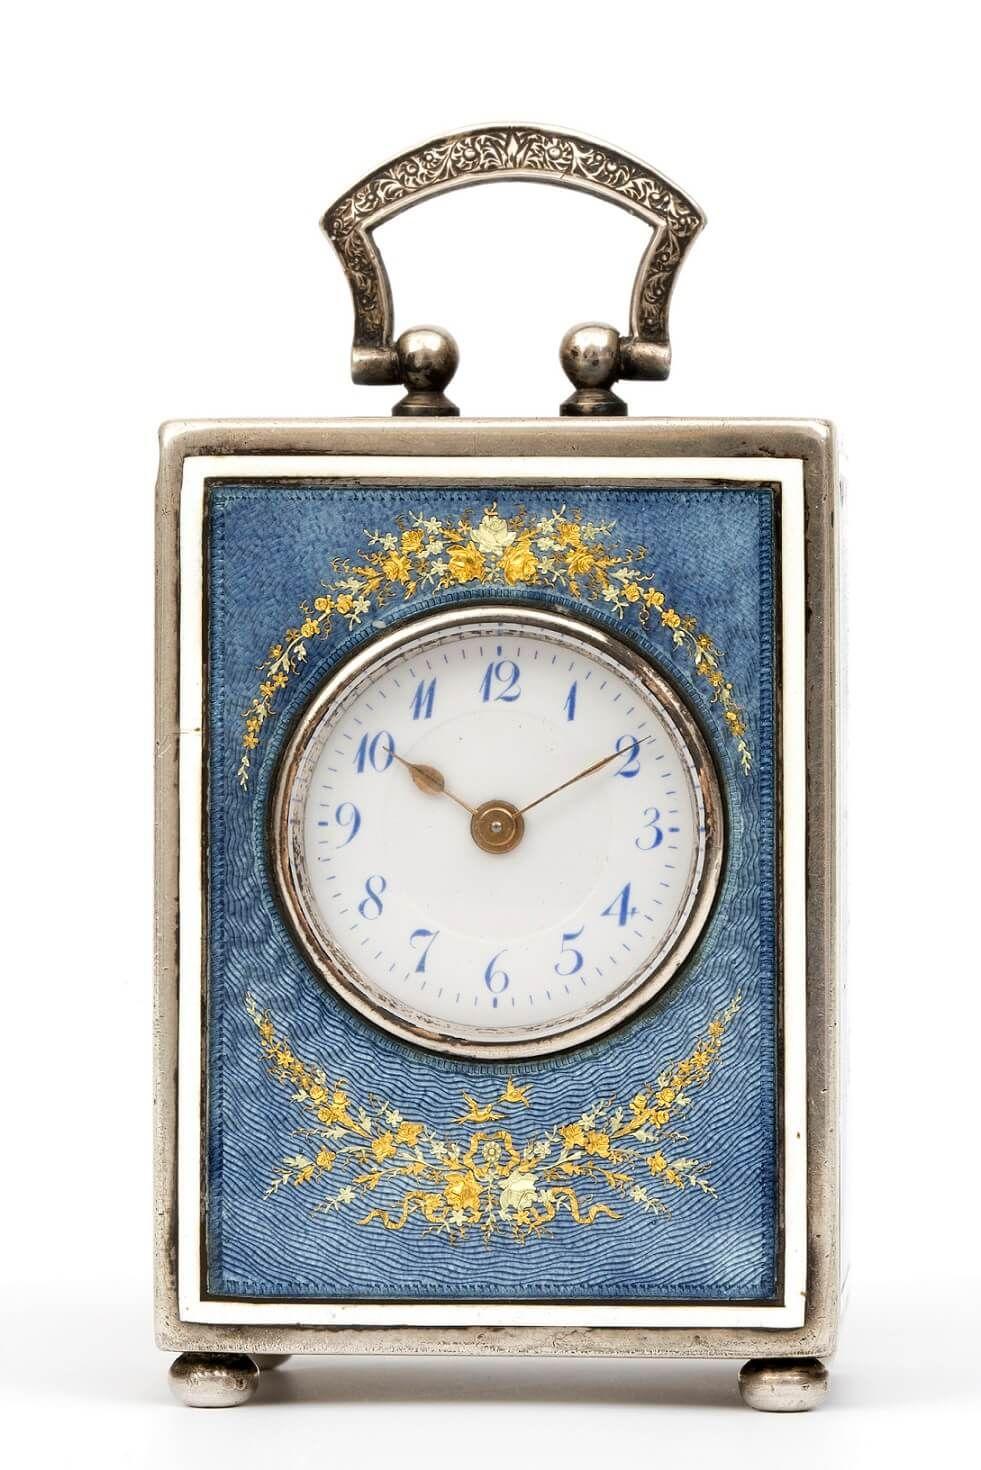 A Swiss silver miniature translucent enamel travel clock